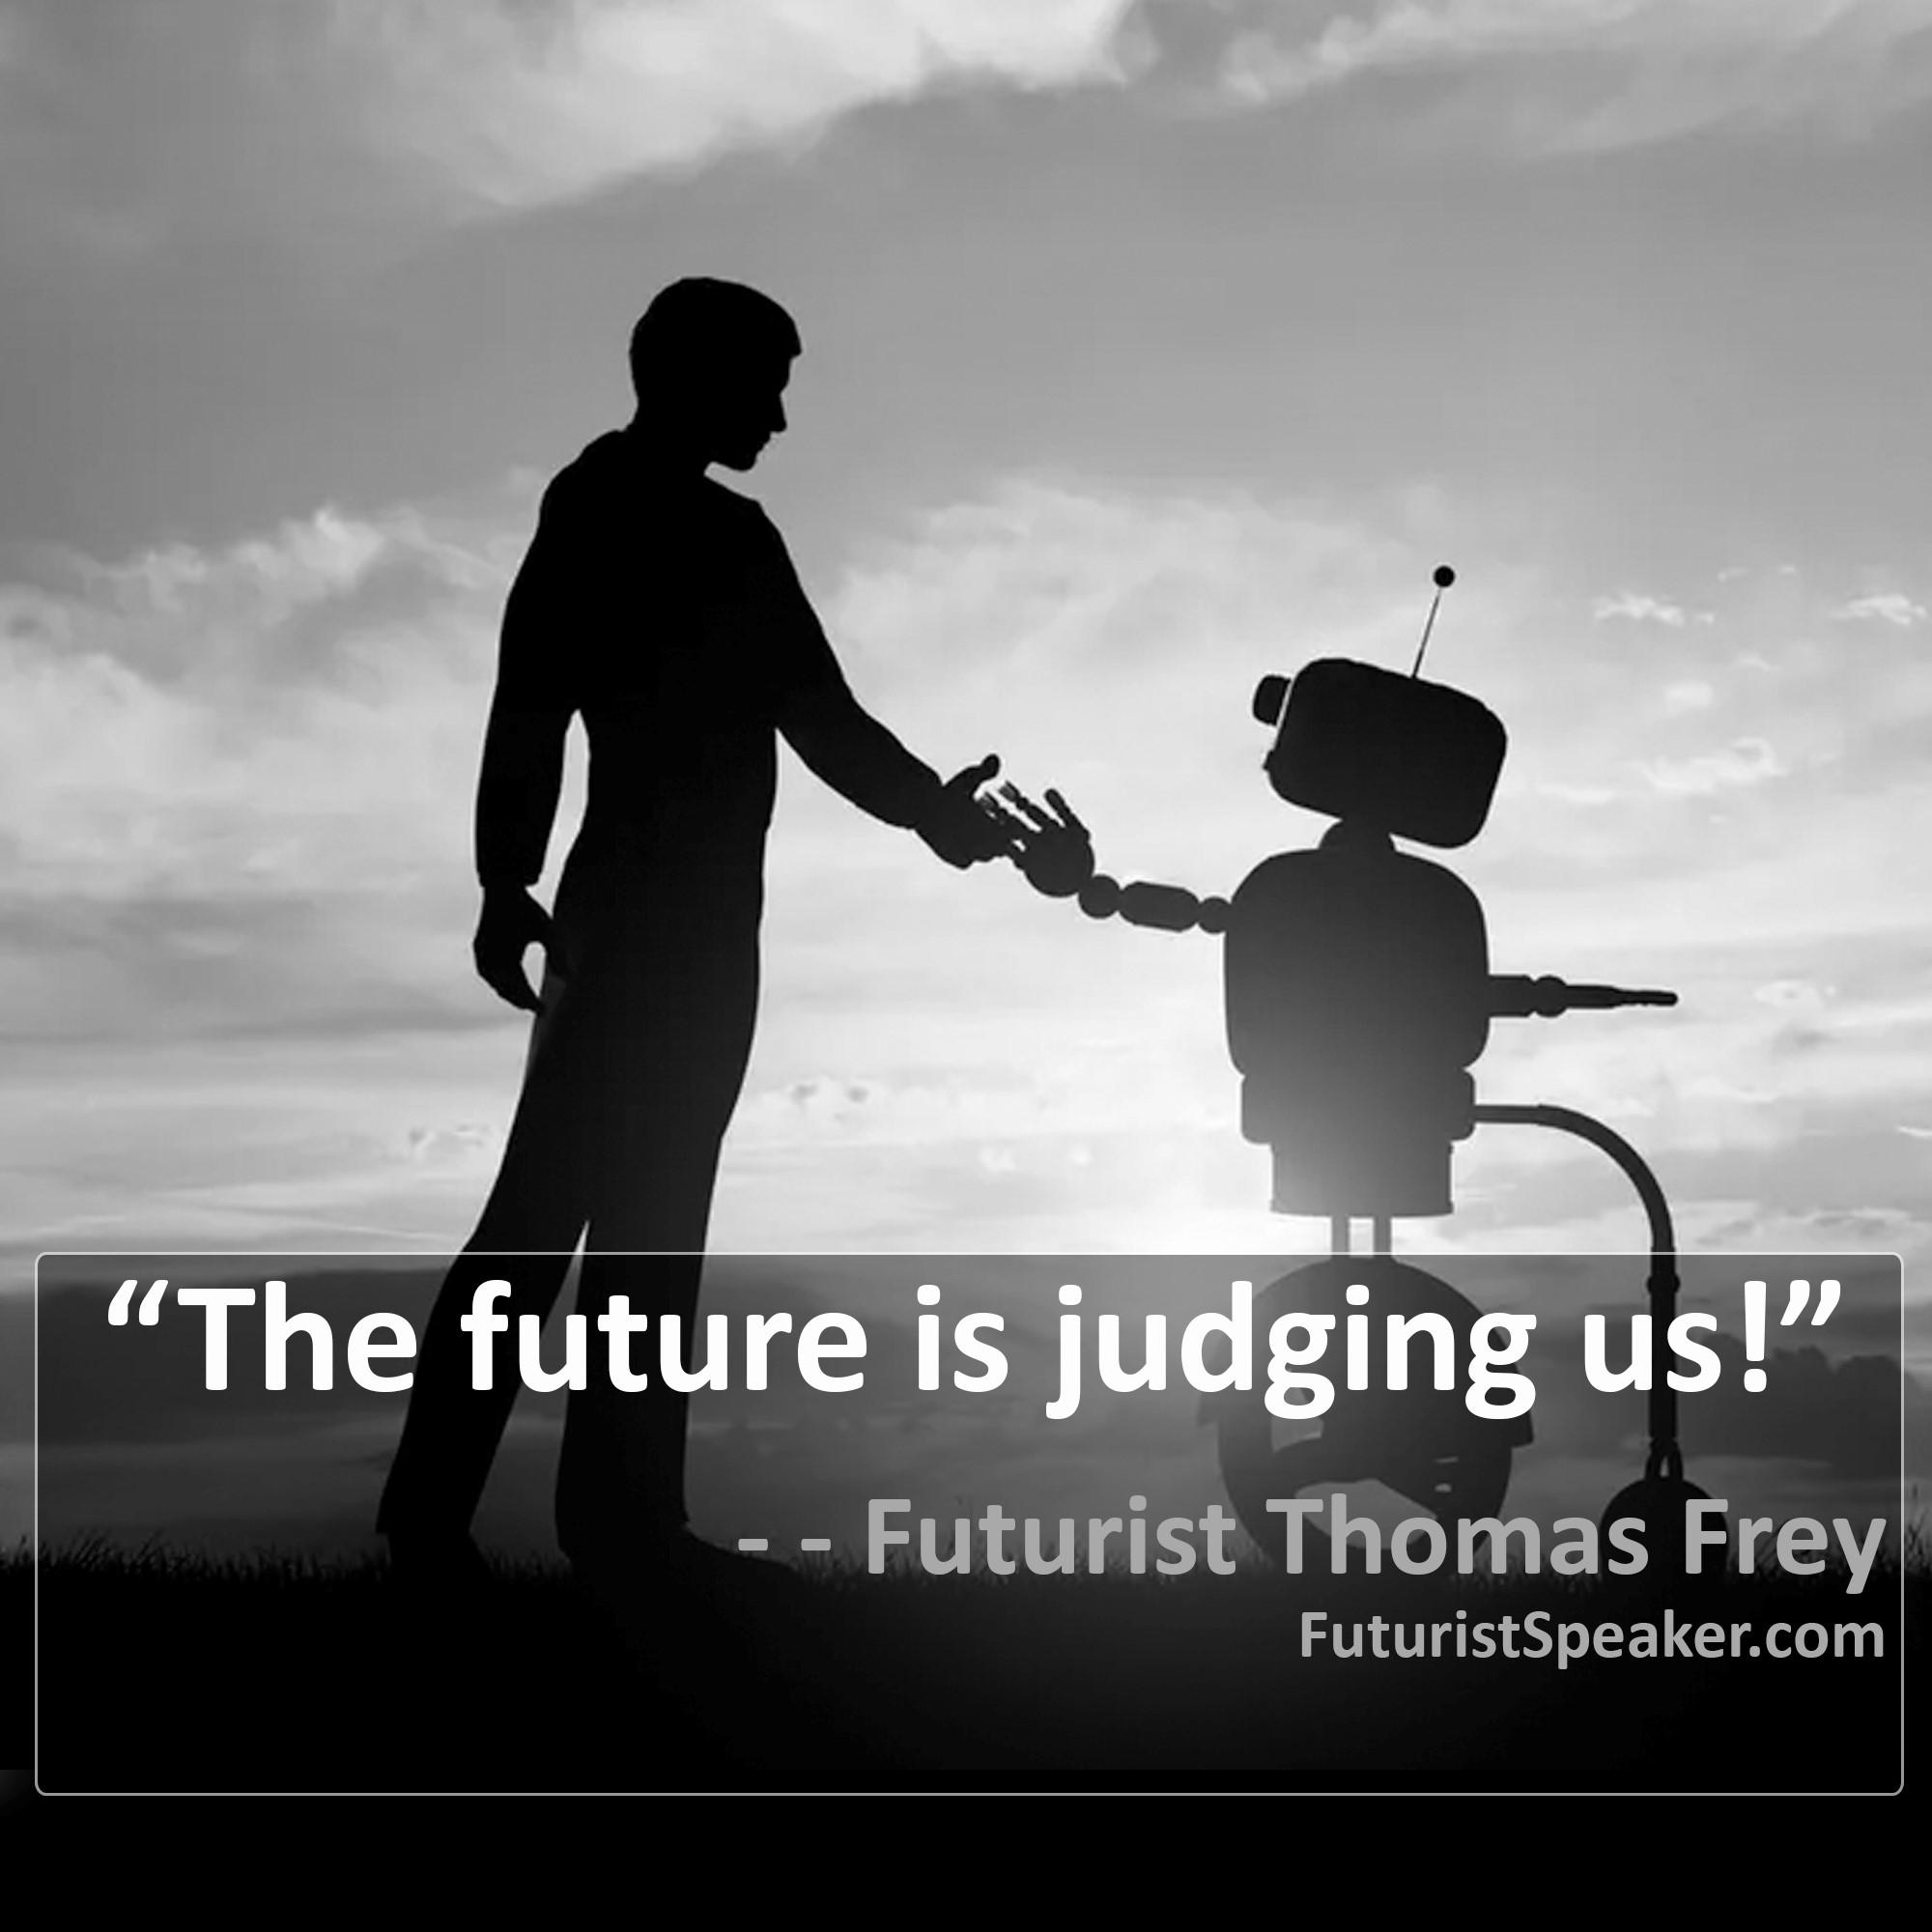 Thomas Frey Futurist Speaker Famous Quote: The future is judging us.